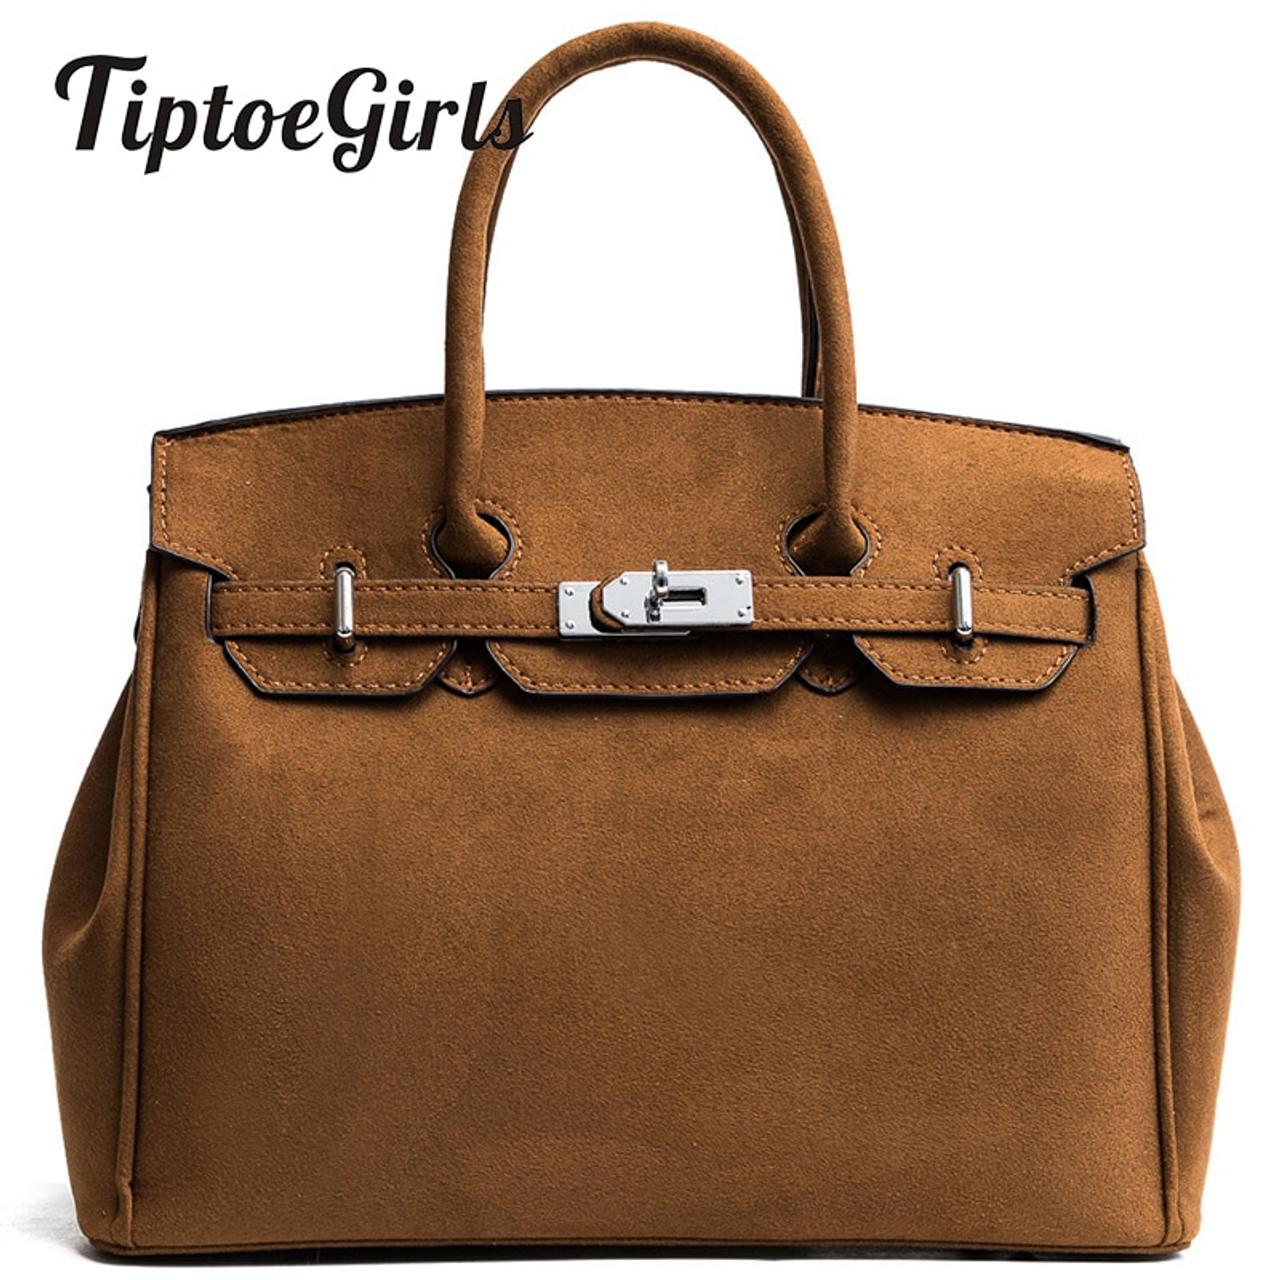 dcbad31ff0 Retro PU Leather Women Handbags Fashion Female Shoulder Bag Large Capacity  Girls Messenger Bags Simple Lock ...